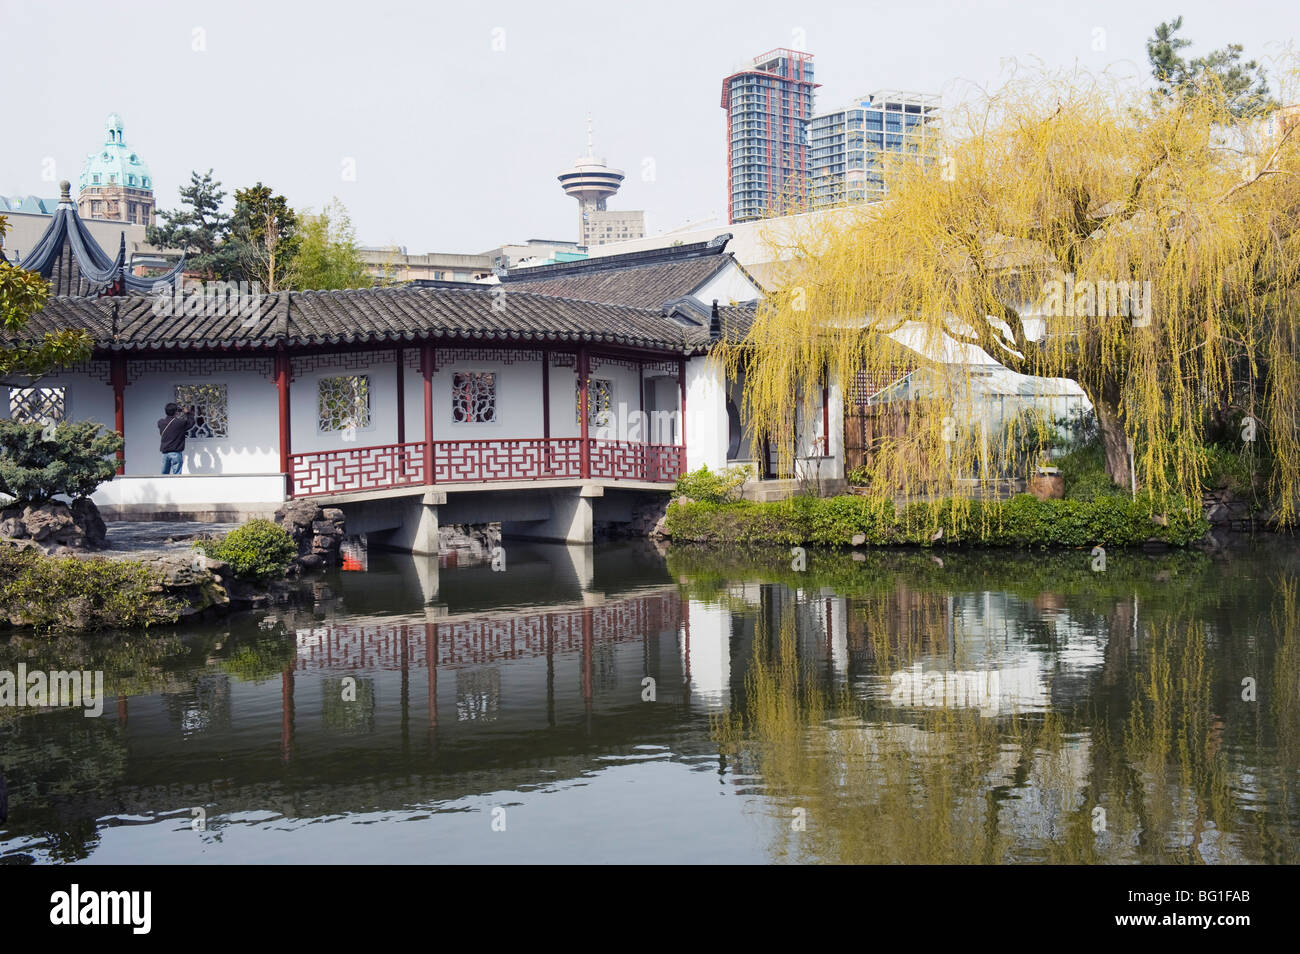 Pavilion in Dr. Sun Yat Sen Park, Chinatown, Vancouver, British Columbia, Canada, North America - Stock Image